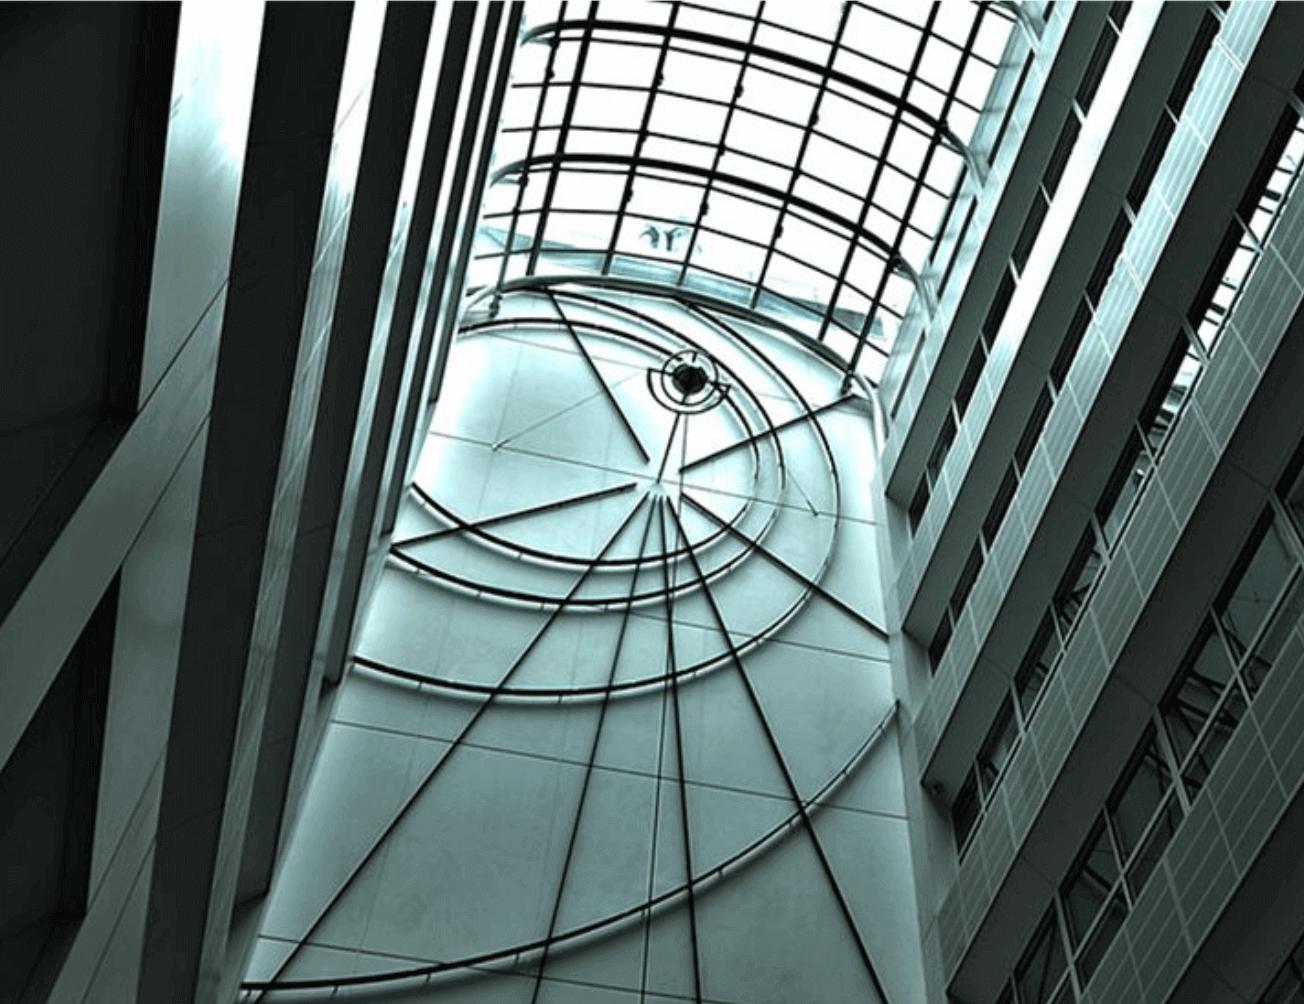 Inside a tall glass building